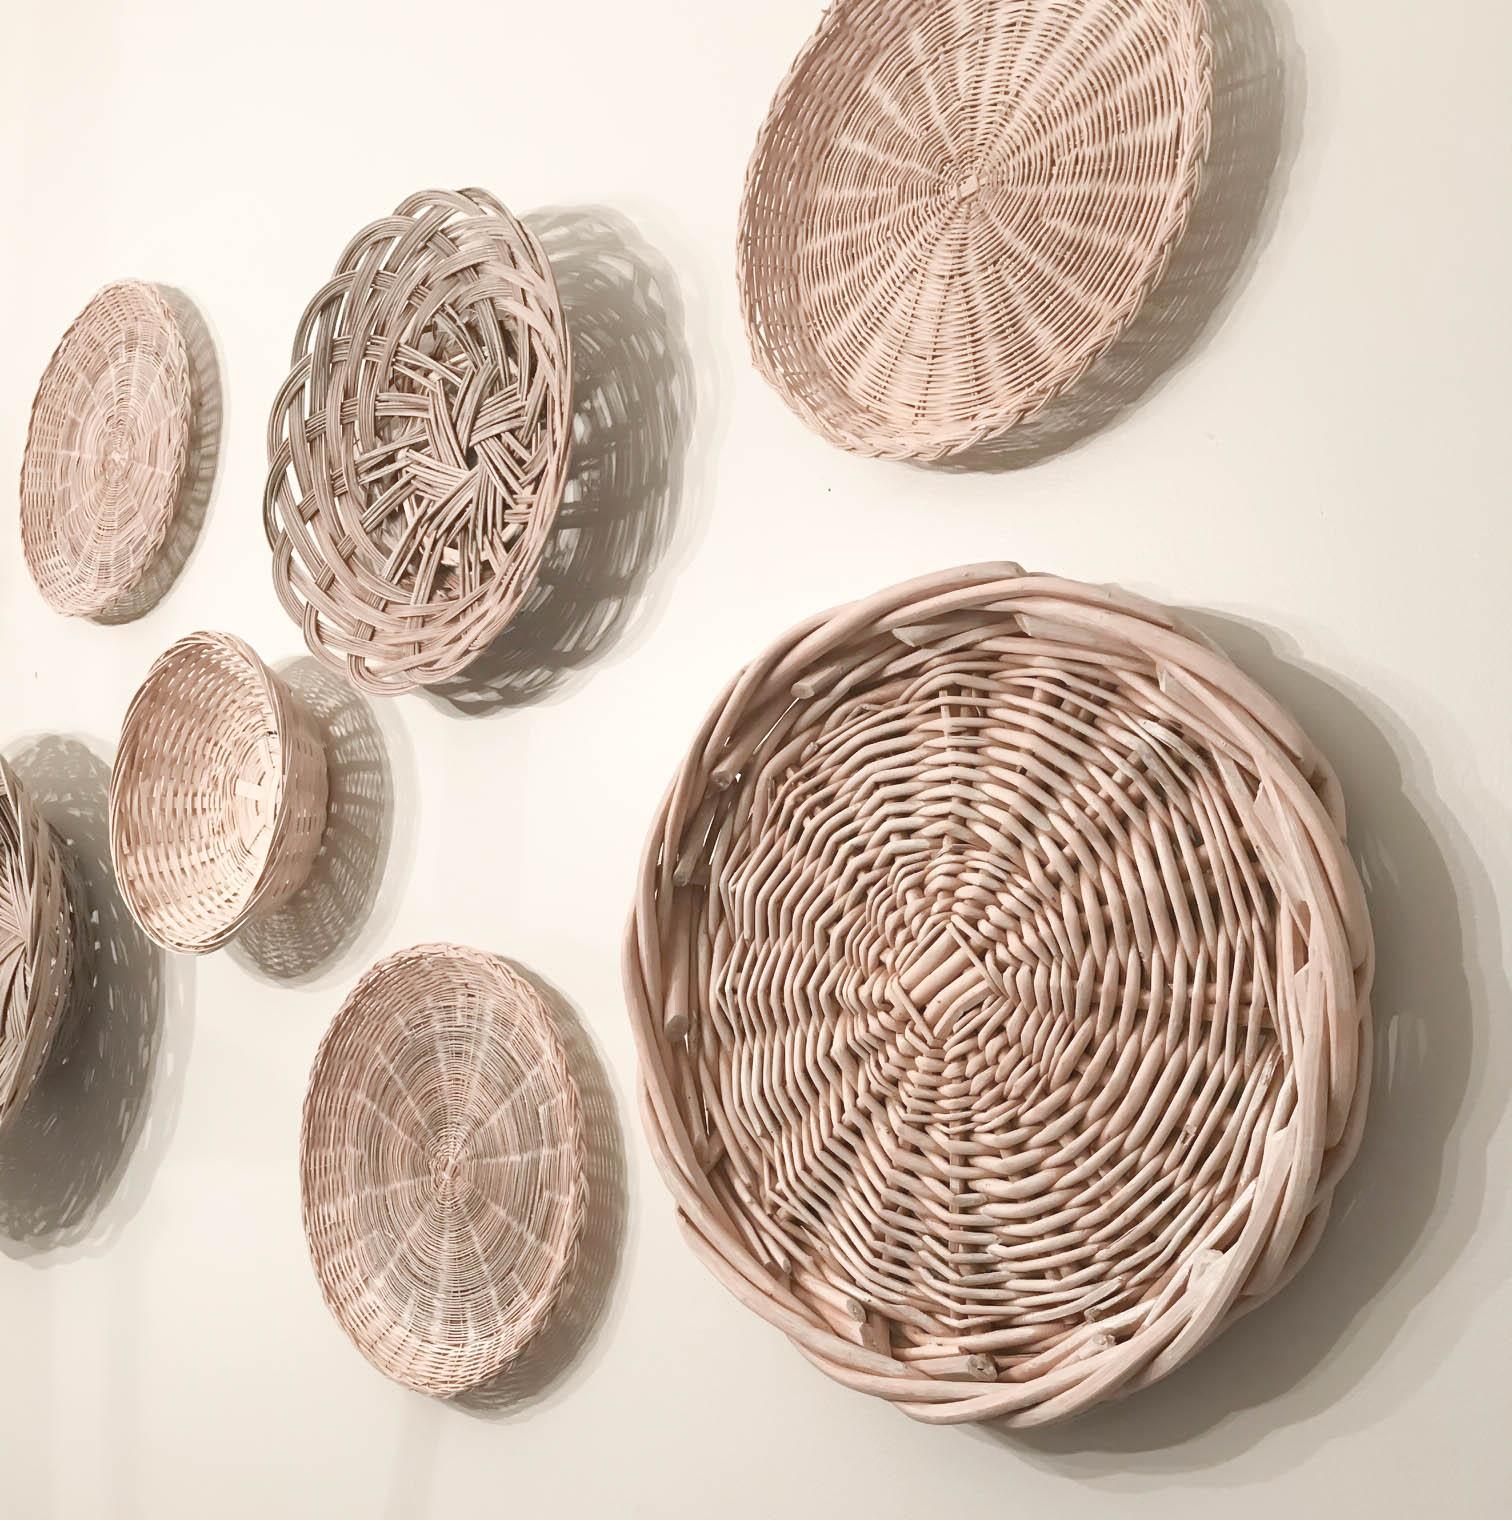 Basket Wall